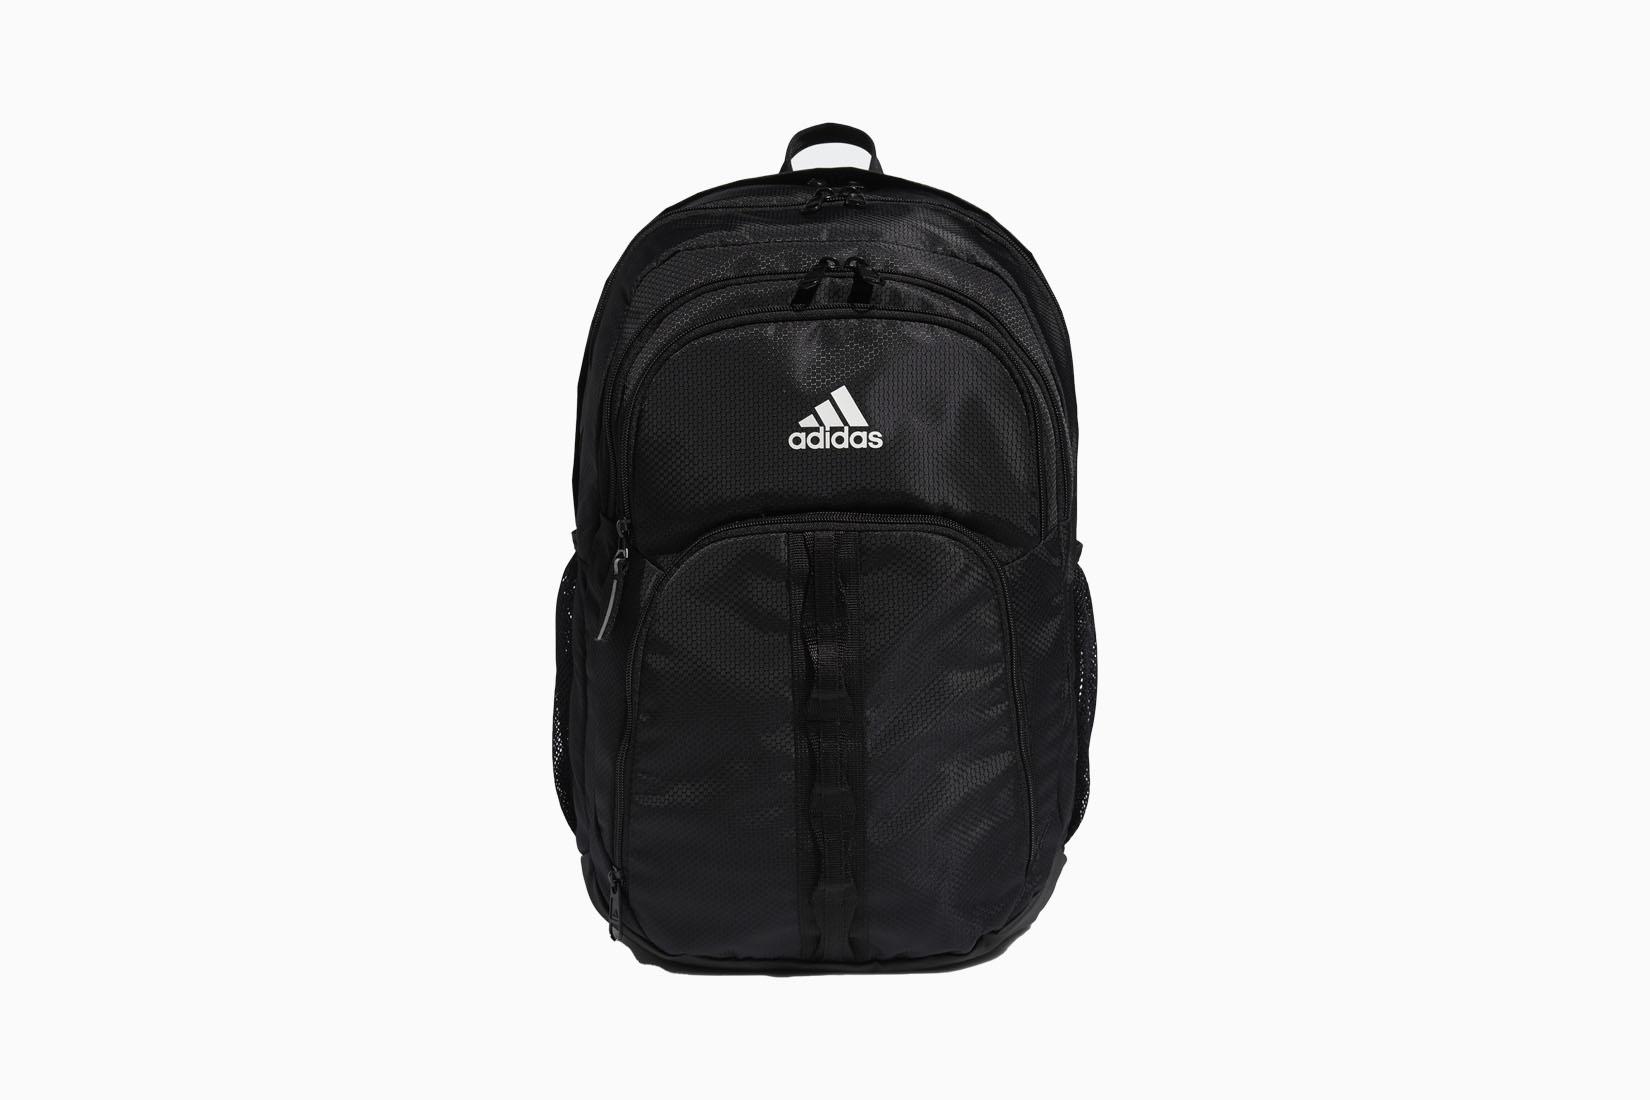 best backpacks women adidas review Luxe Digital